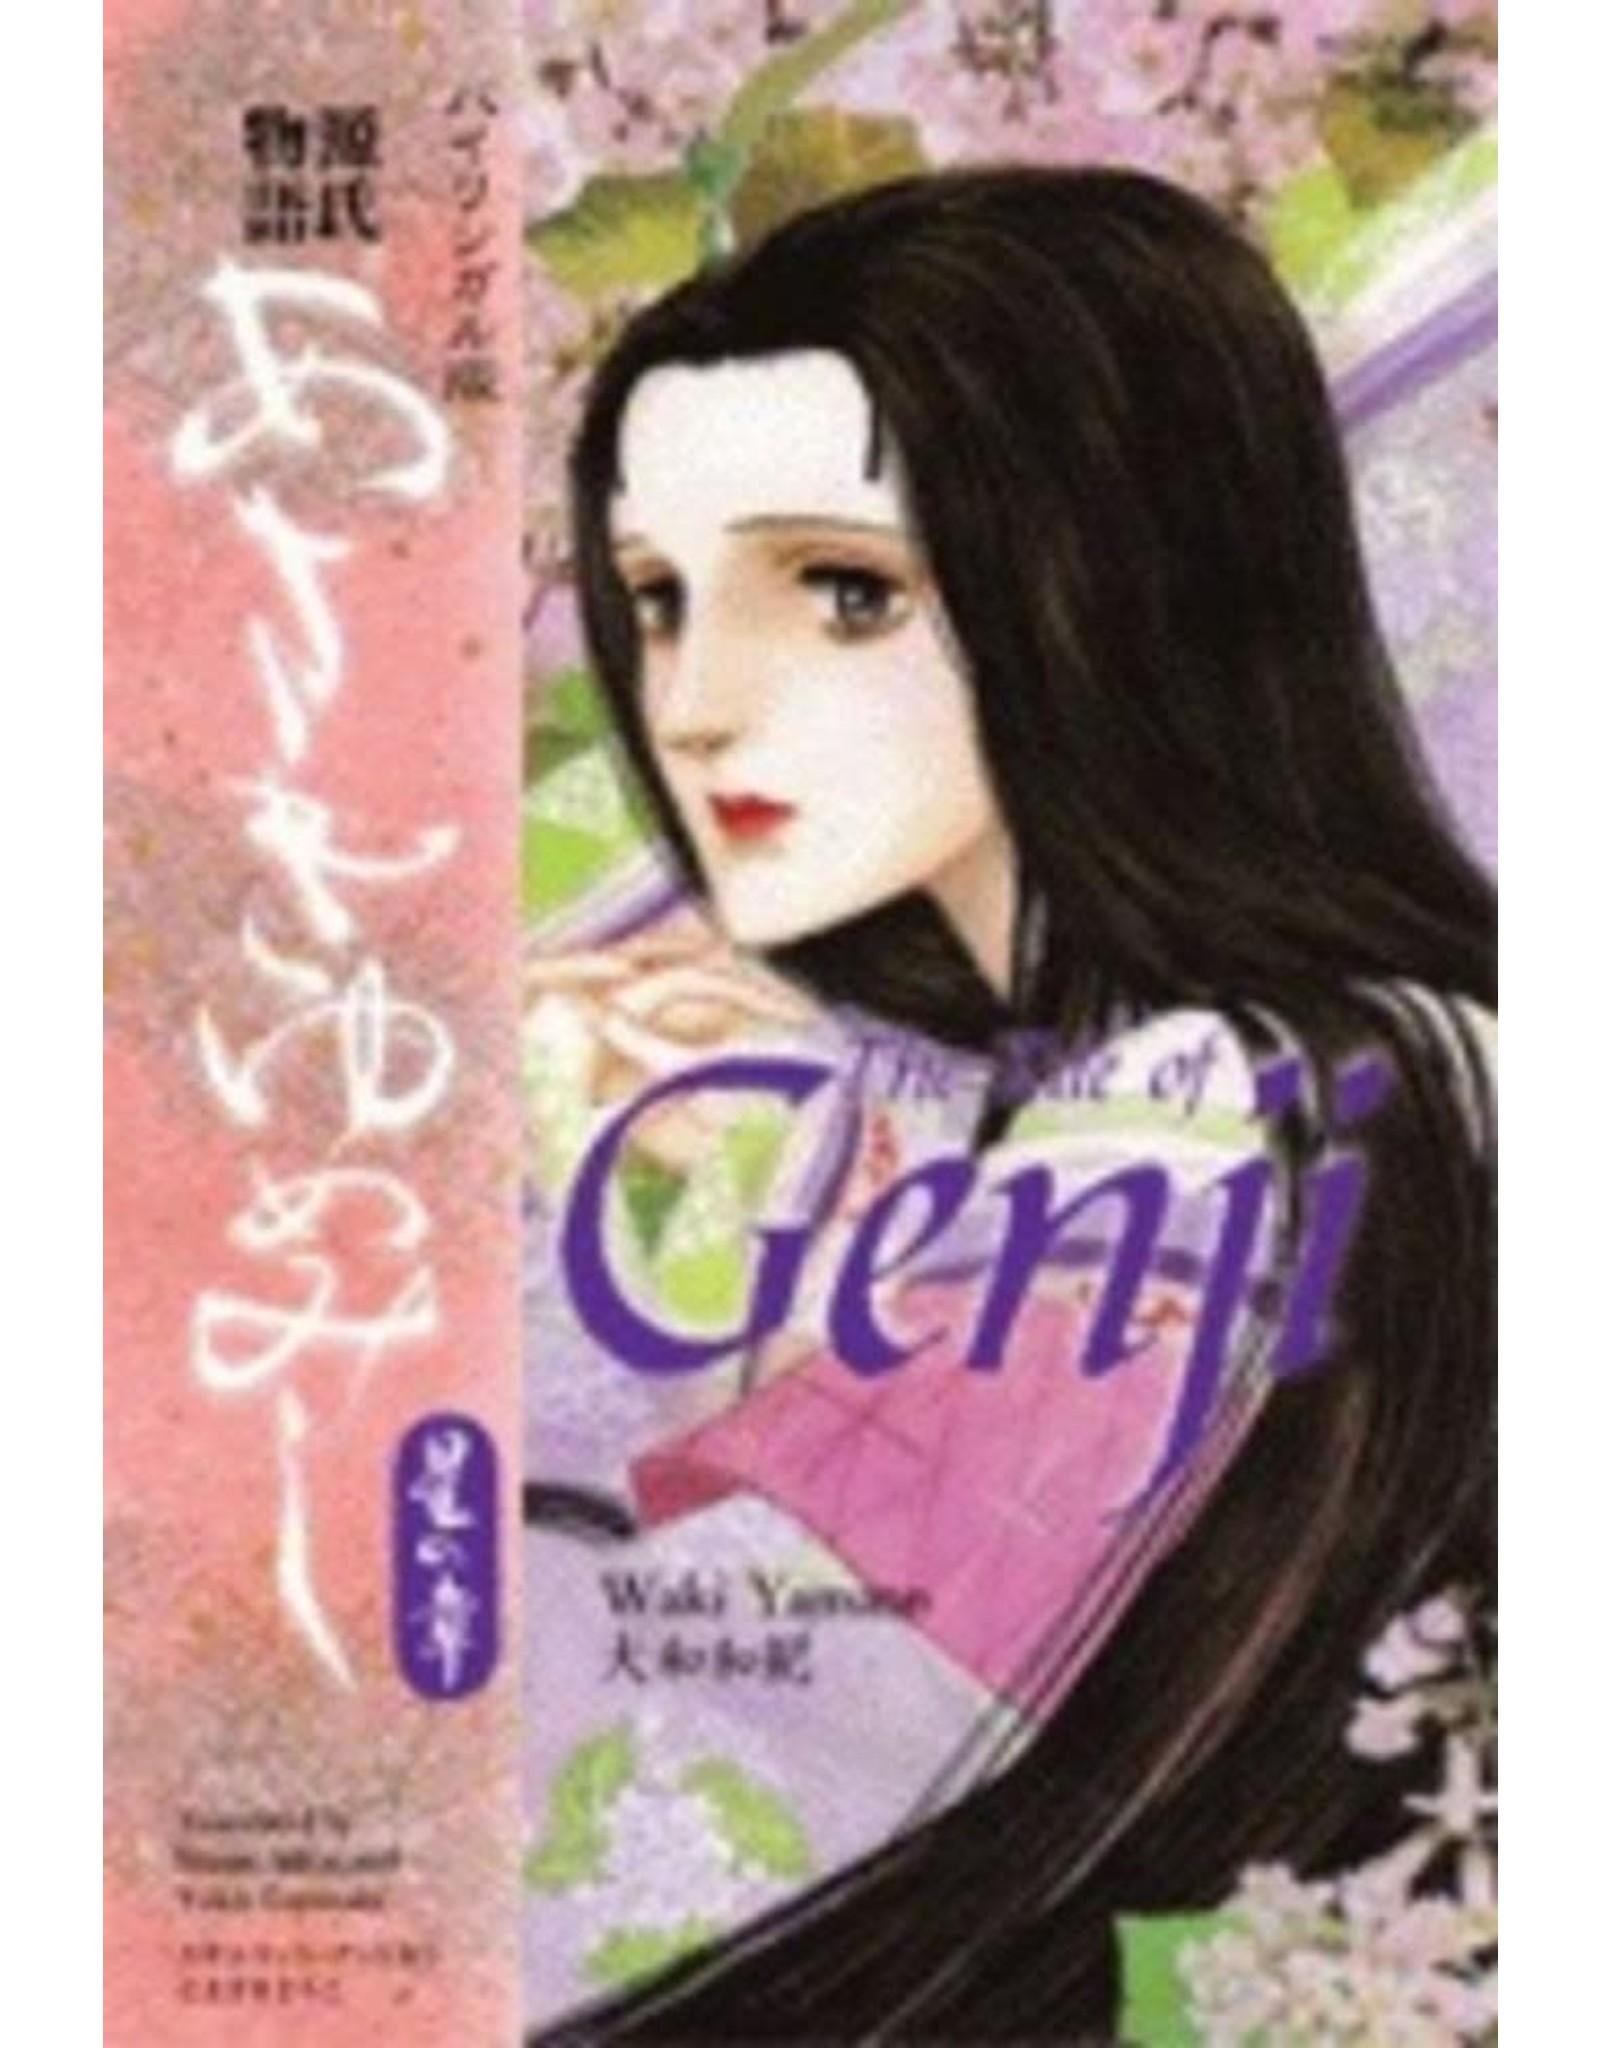 KODANSHA INTERNATIONAL [BILINGUAL] ASAKI YUMEMISHI: THE TALE OF GENJI CHAPTER OF STAR